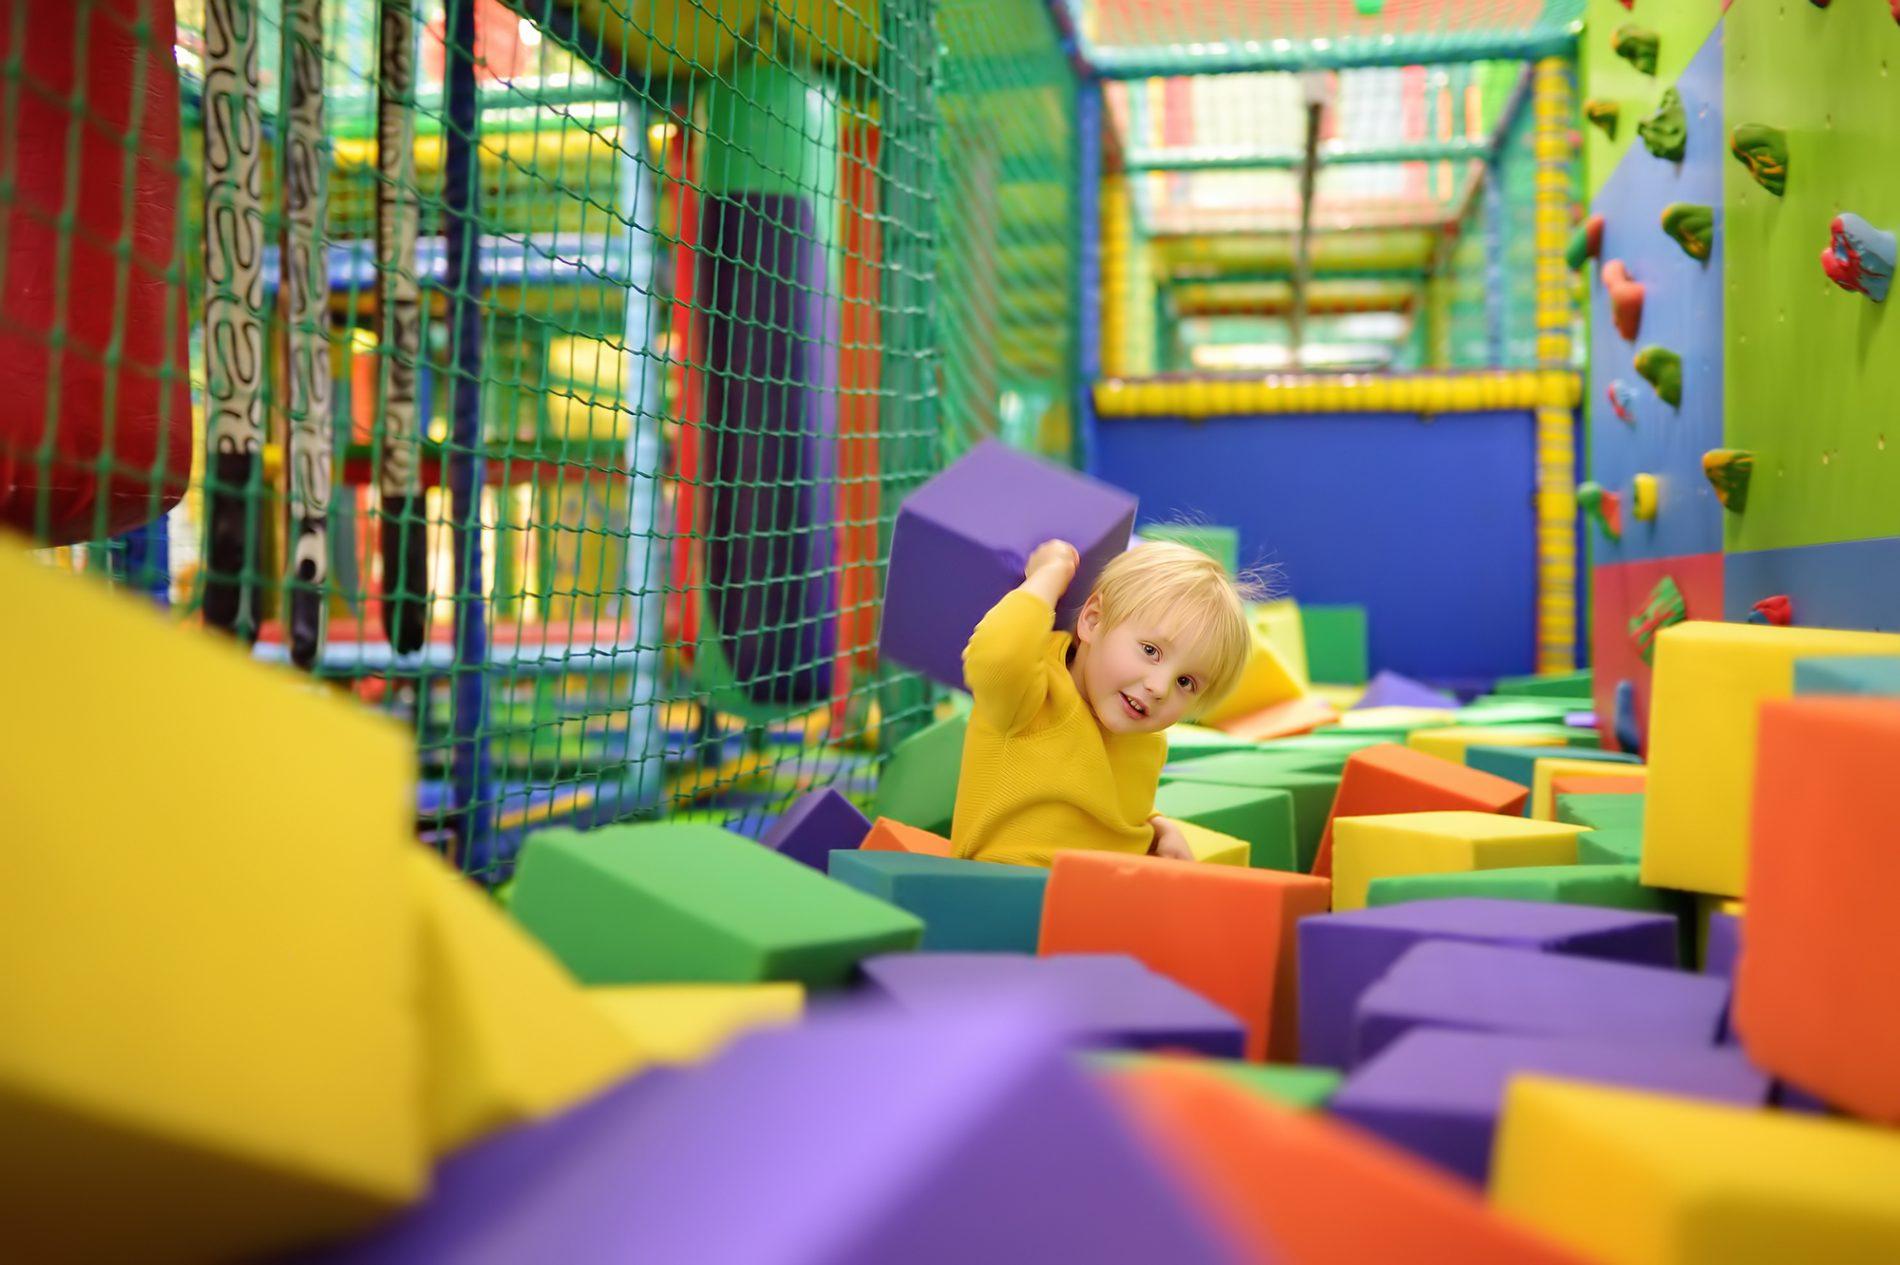 Savia proyectos soft play niño jugando